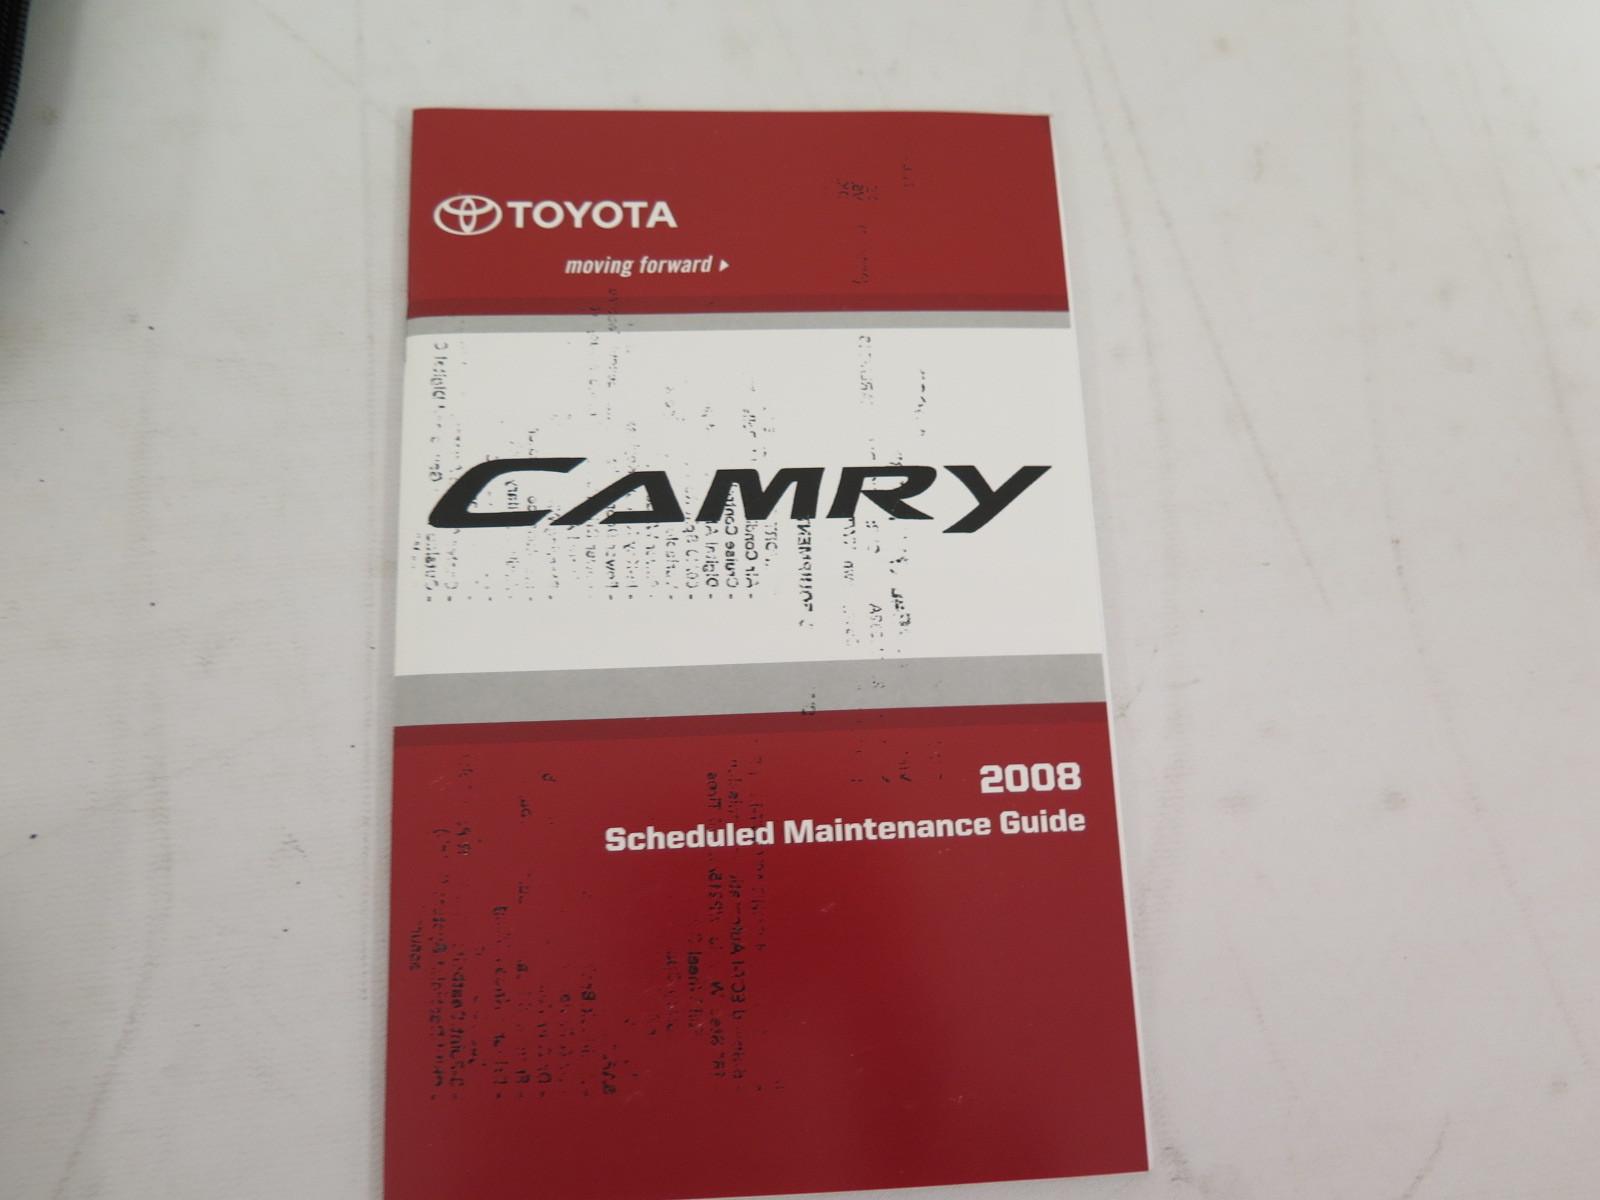 2008 toyota camry owners manual book bashful yak rh bashfulyak com toyota camry owners manual download toyota camry owners manual download